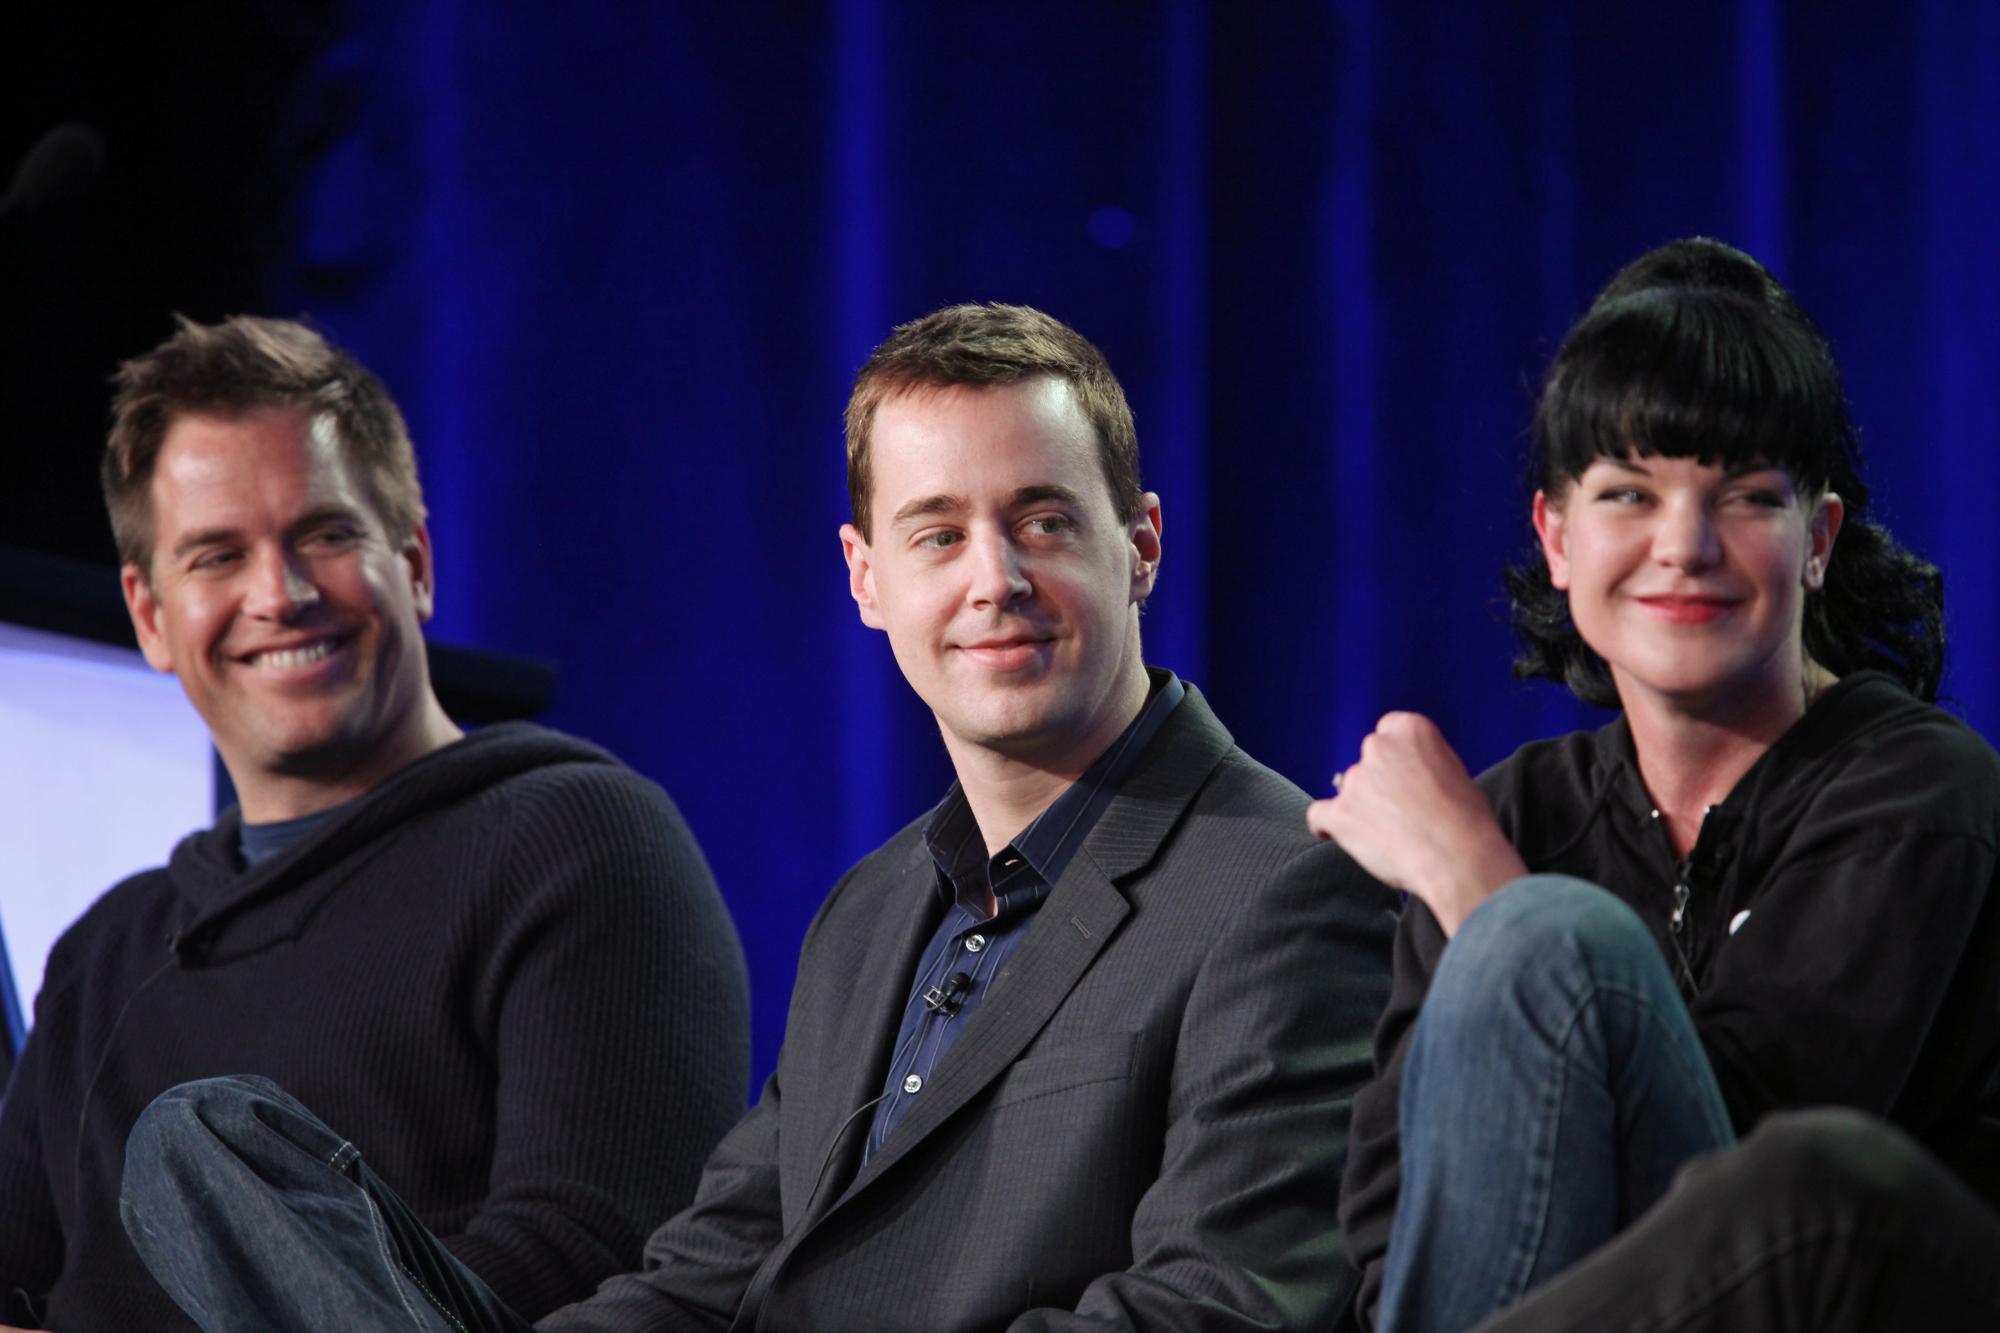 Michael, Sean and Pauley